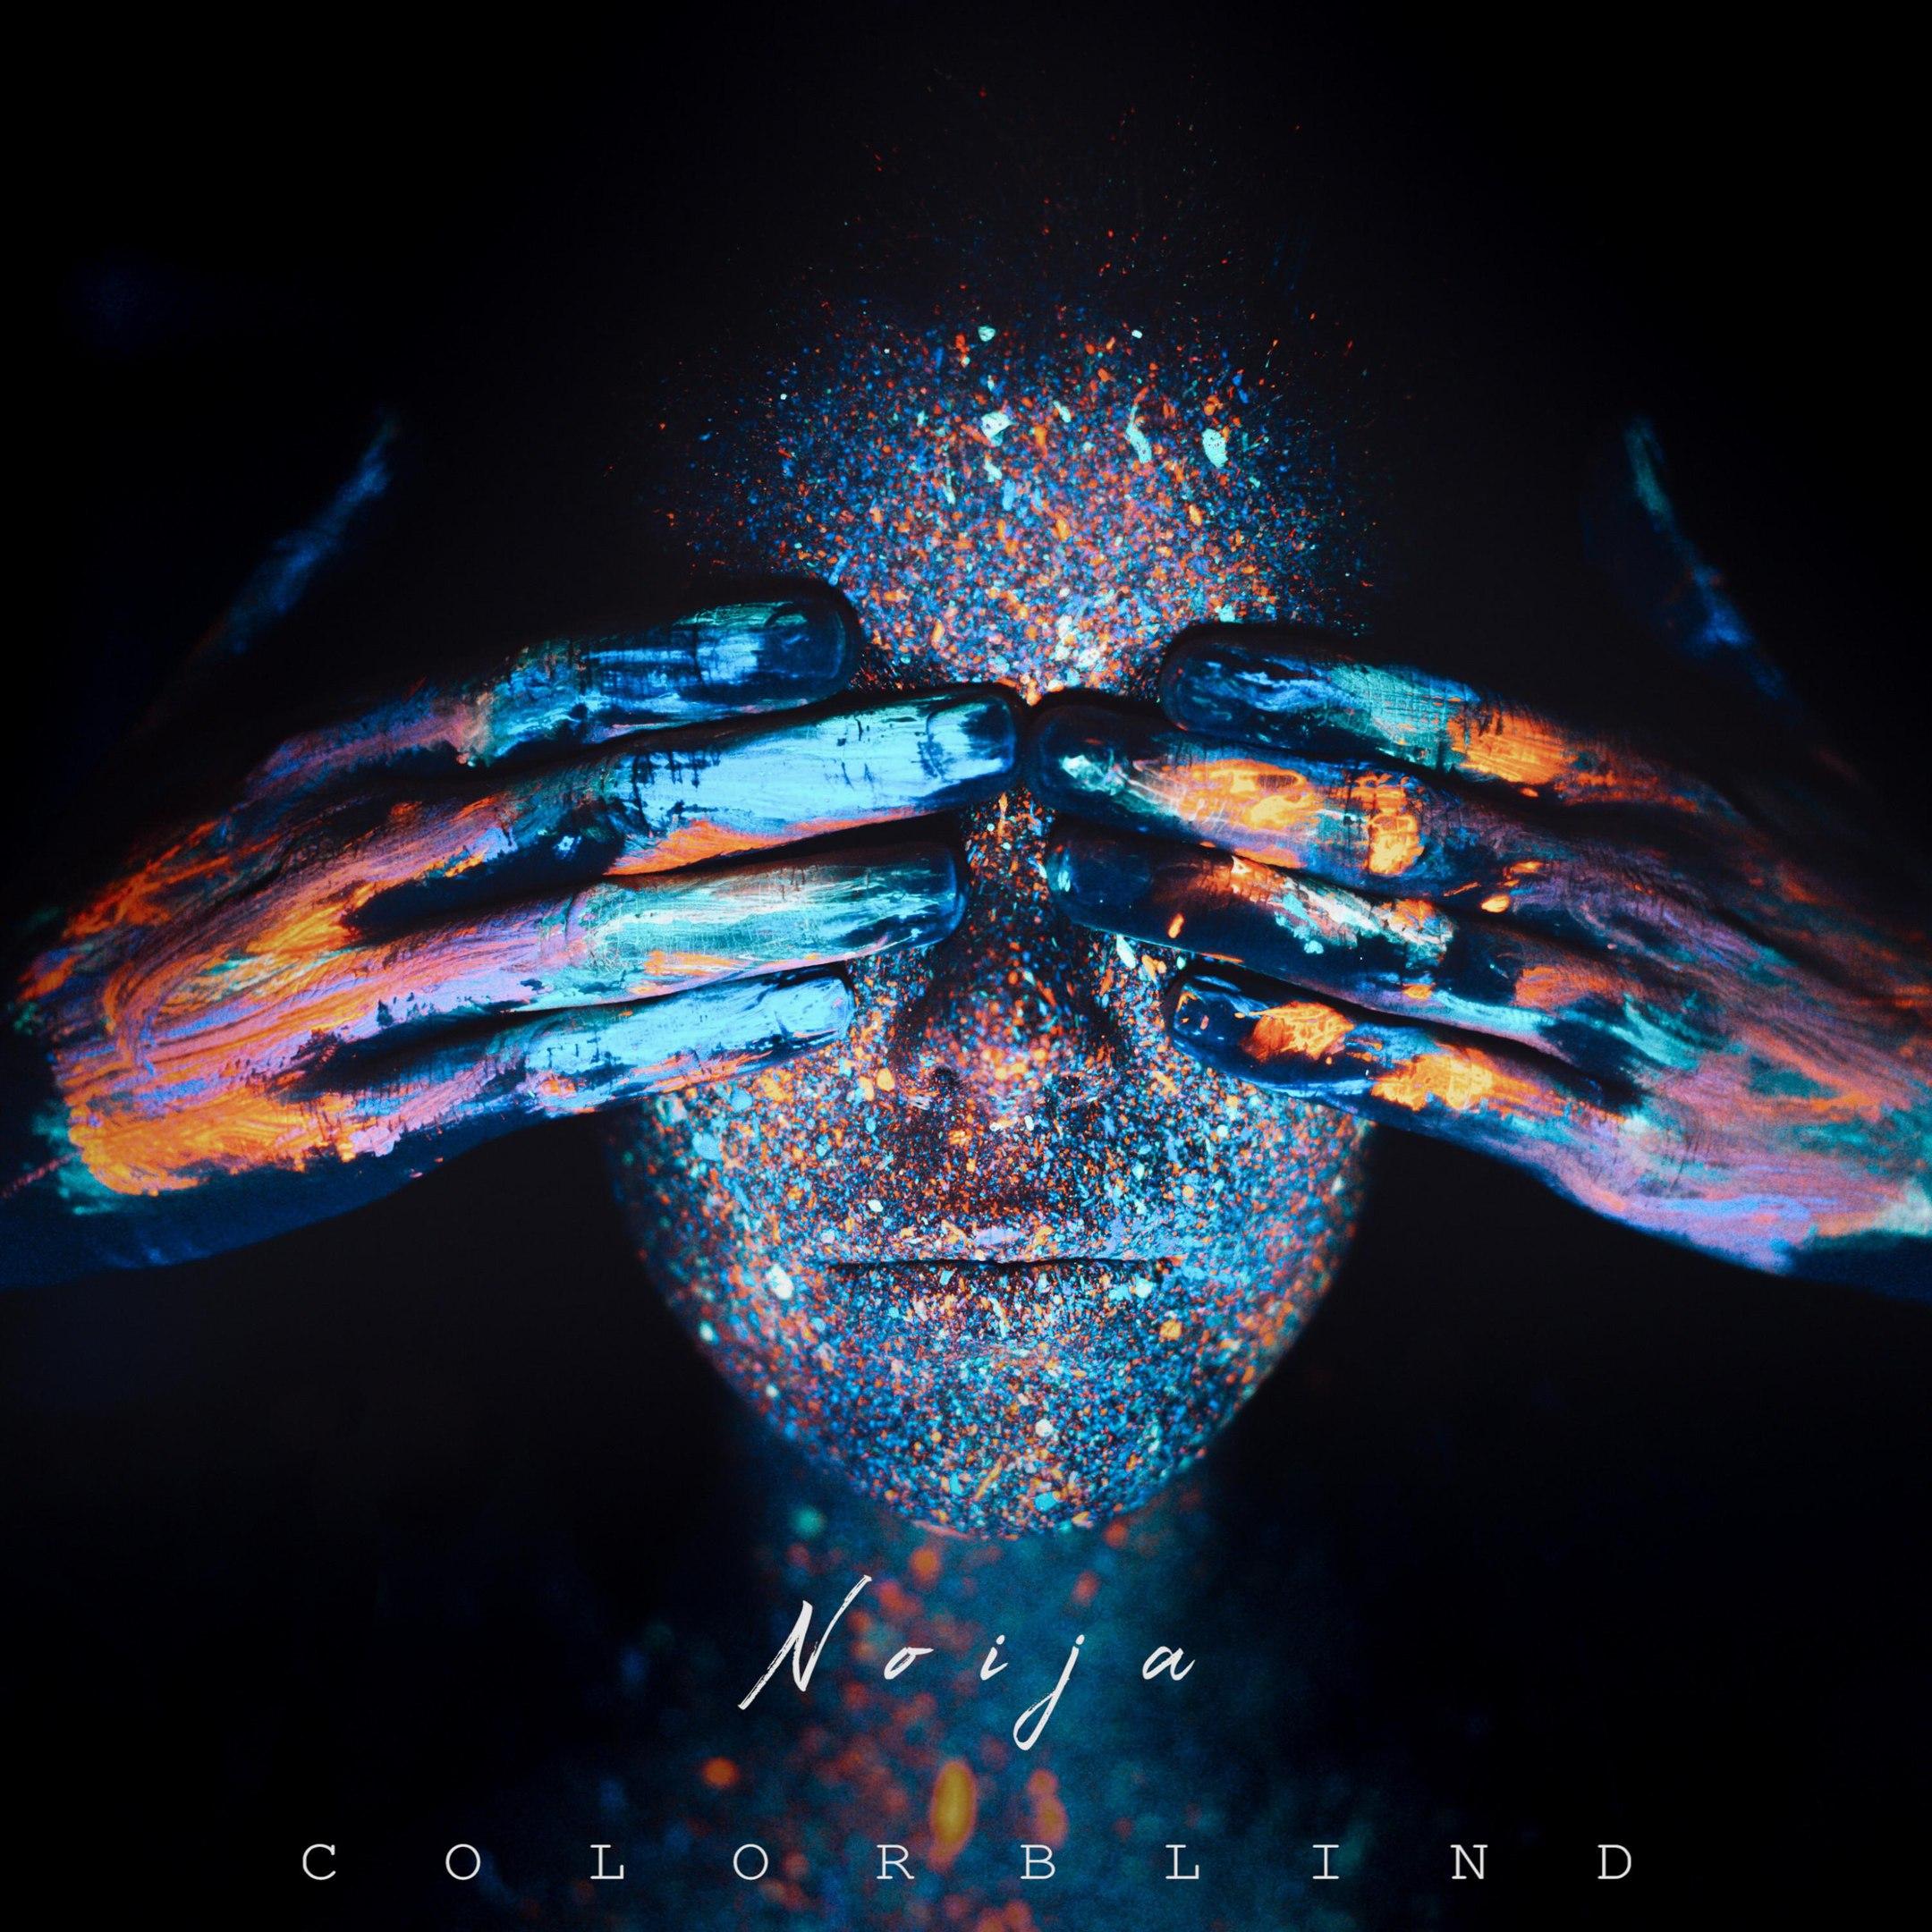 Noija - Colorblind (2017)